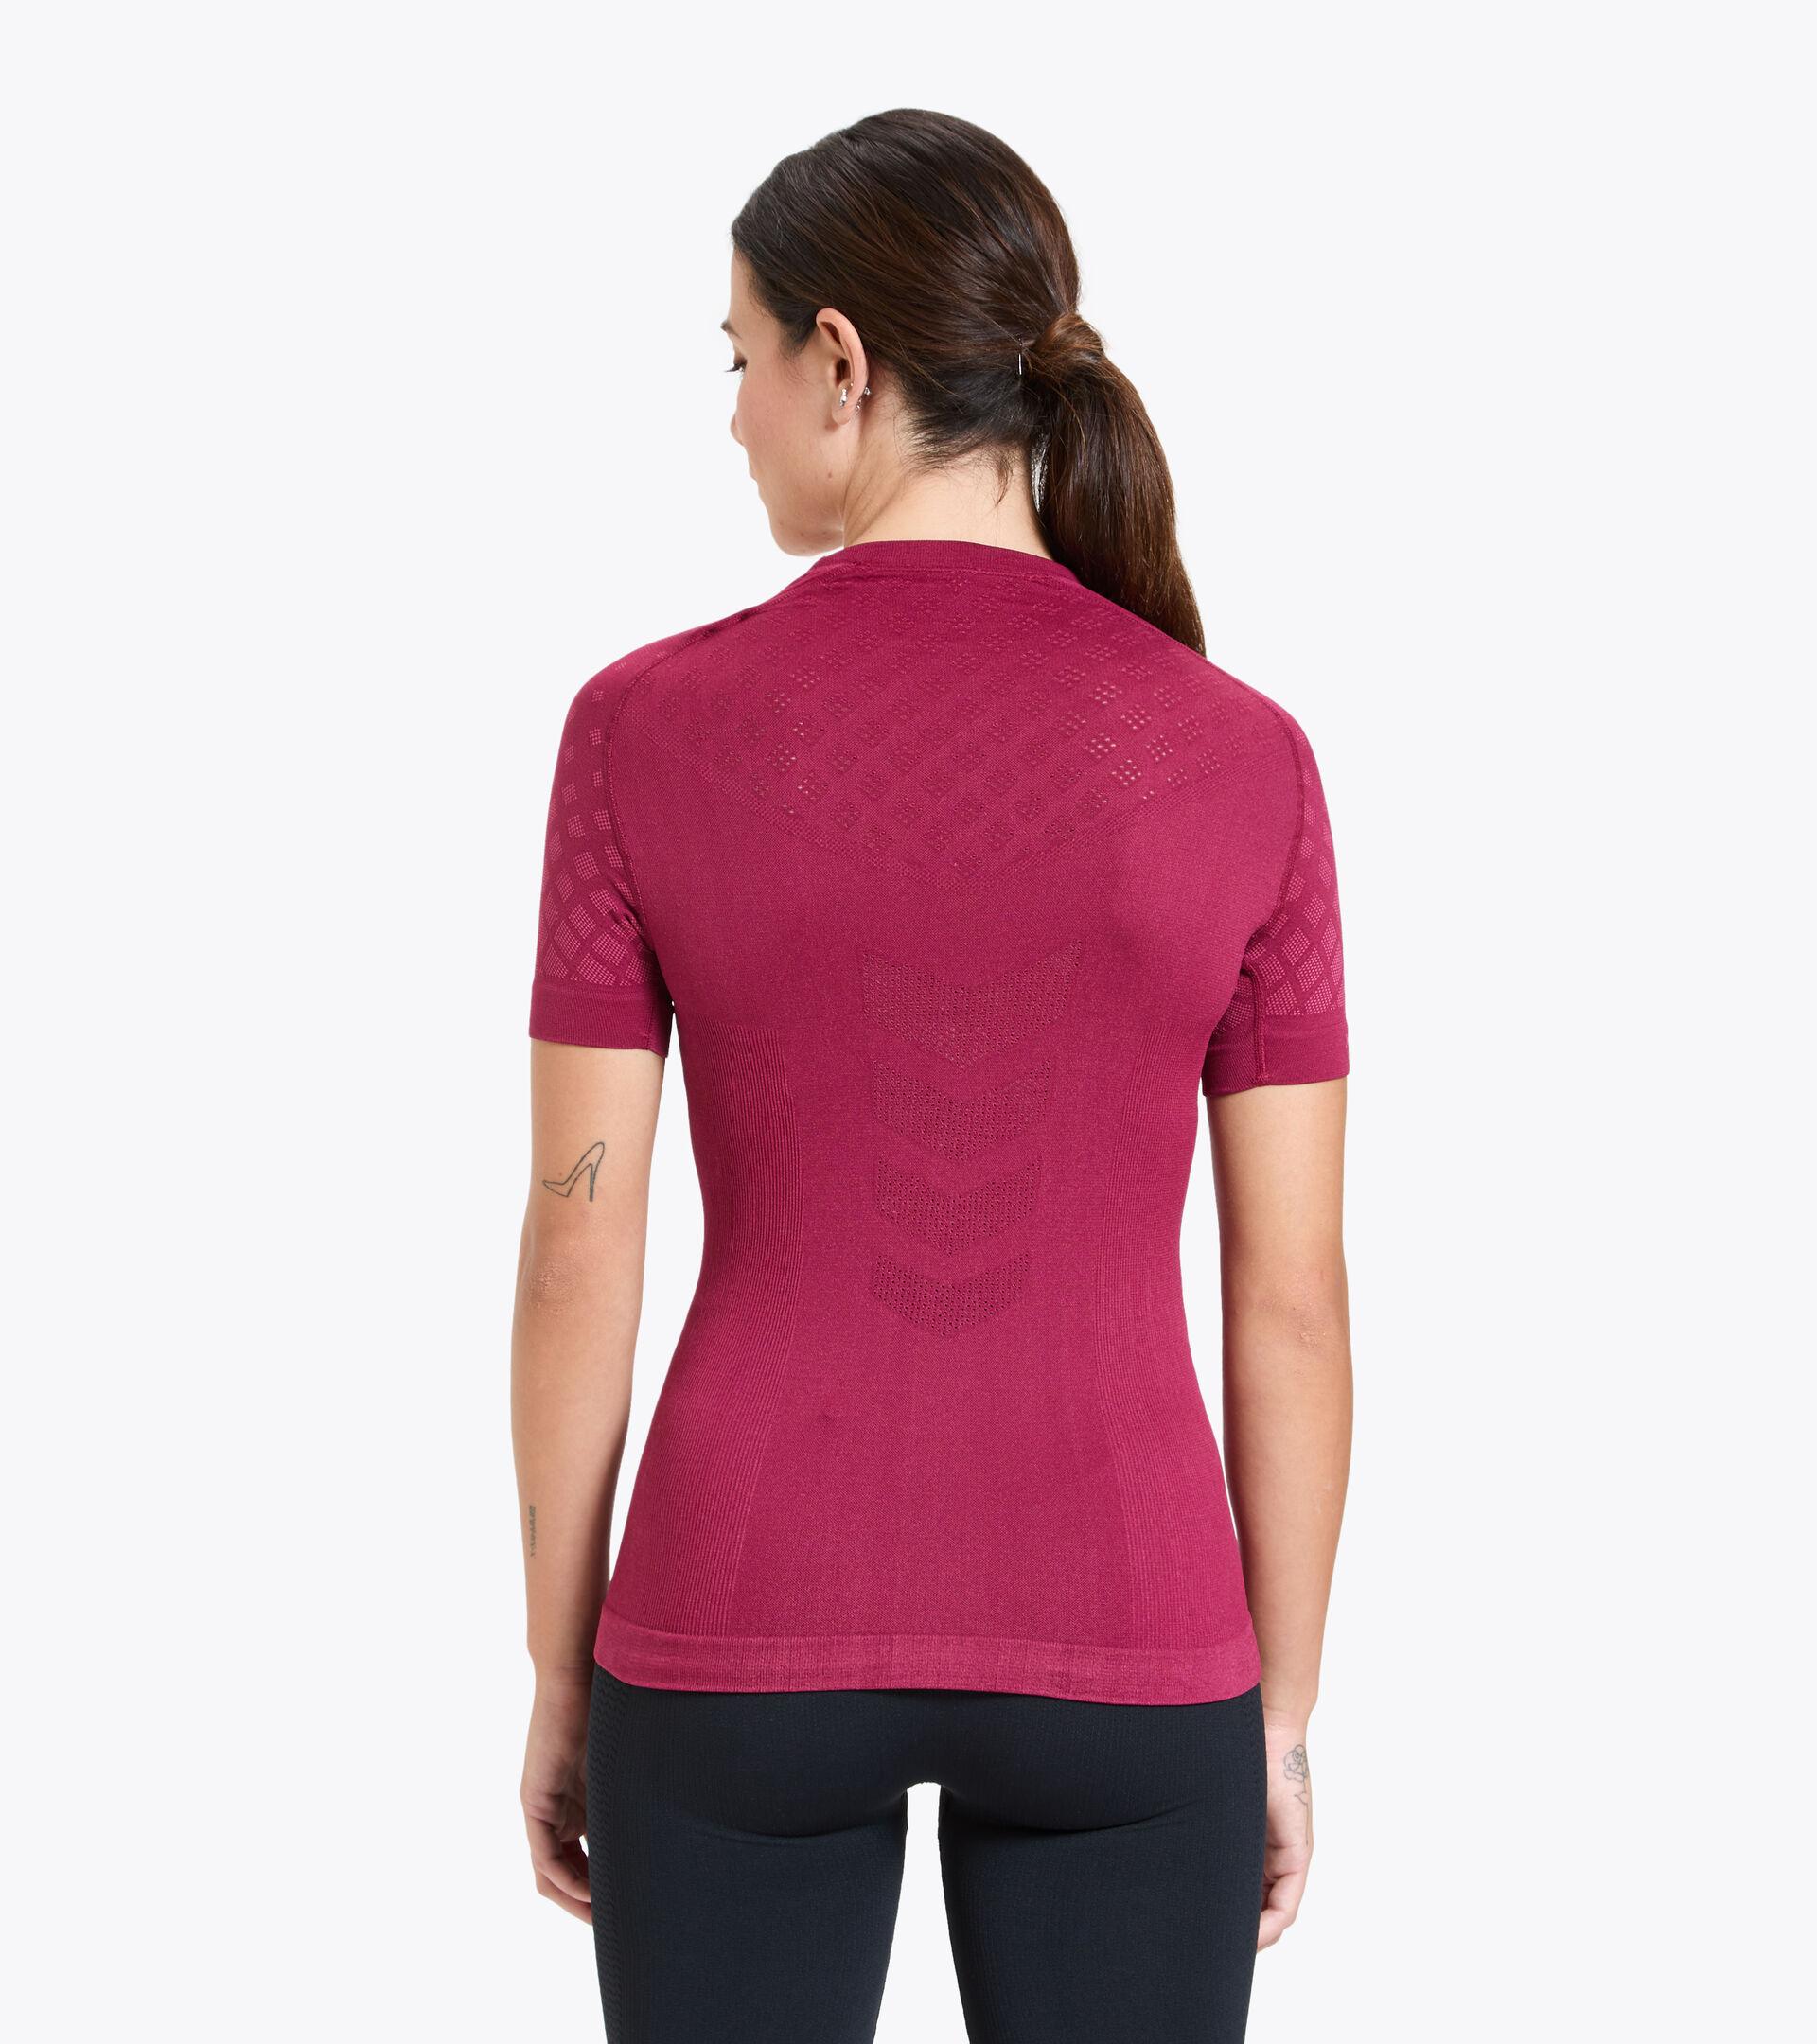 Trainings-T-shirt - Damen L. SS T-SHIRT ACT RHODODENDRON - Diadora